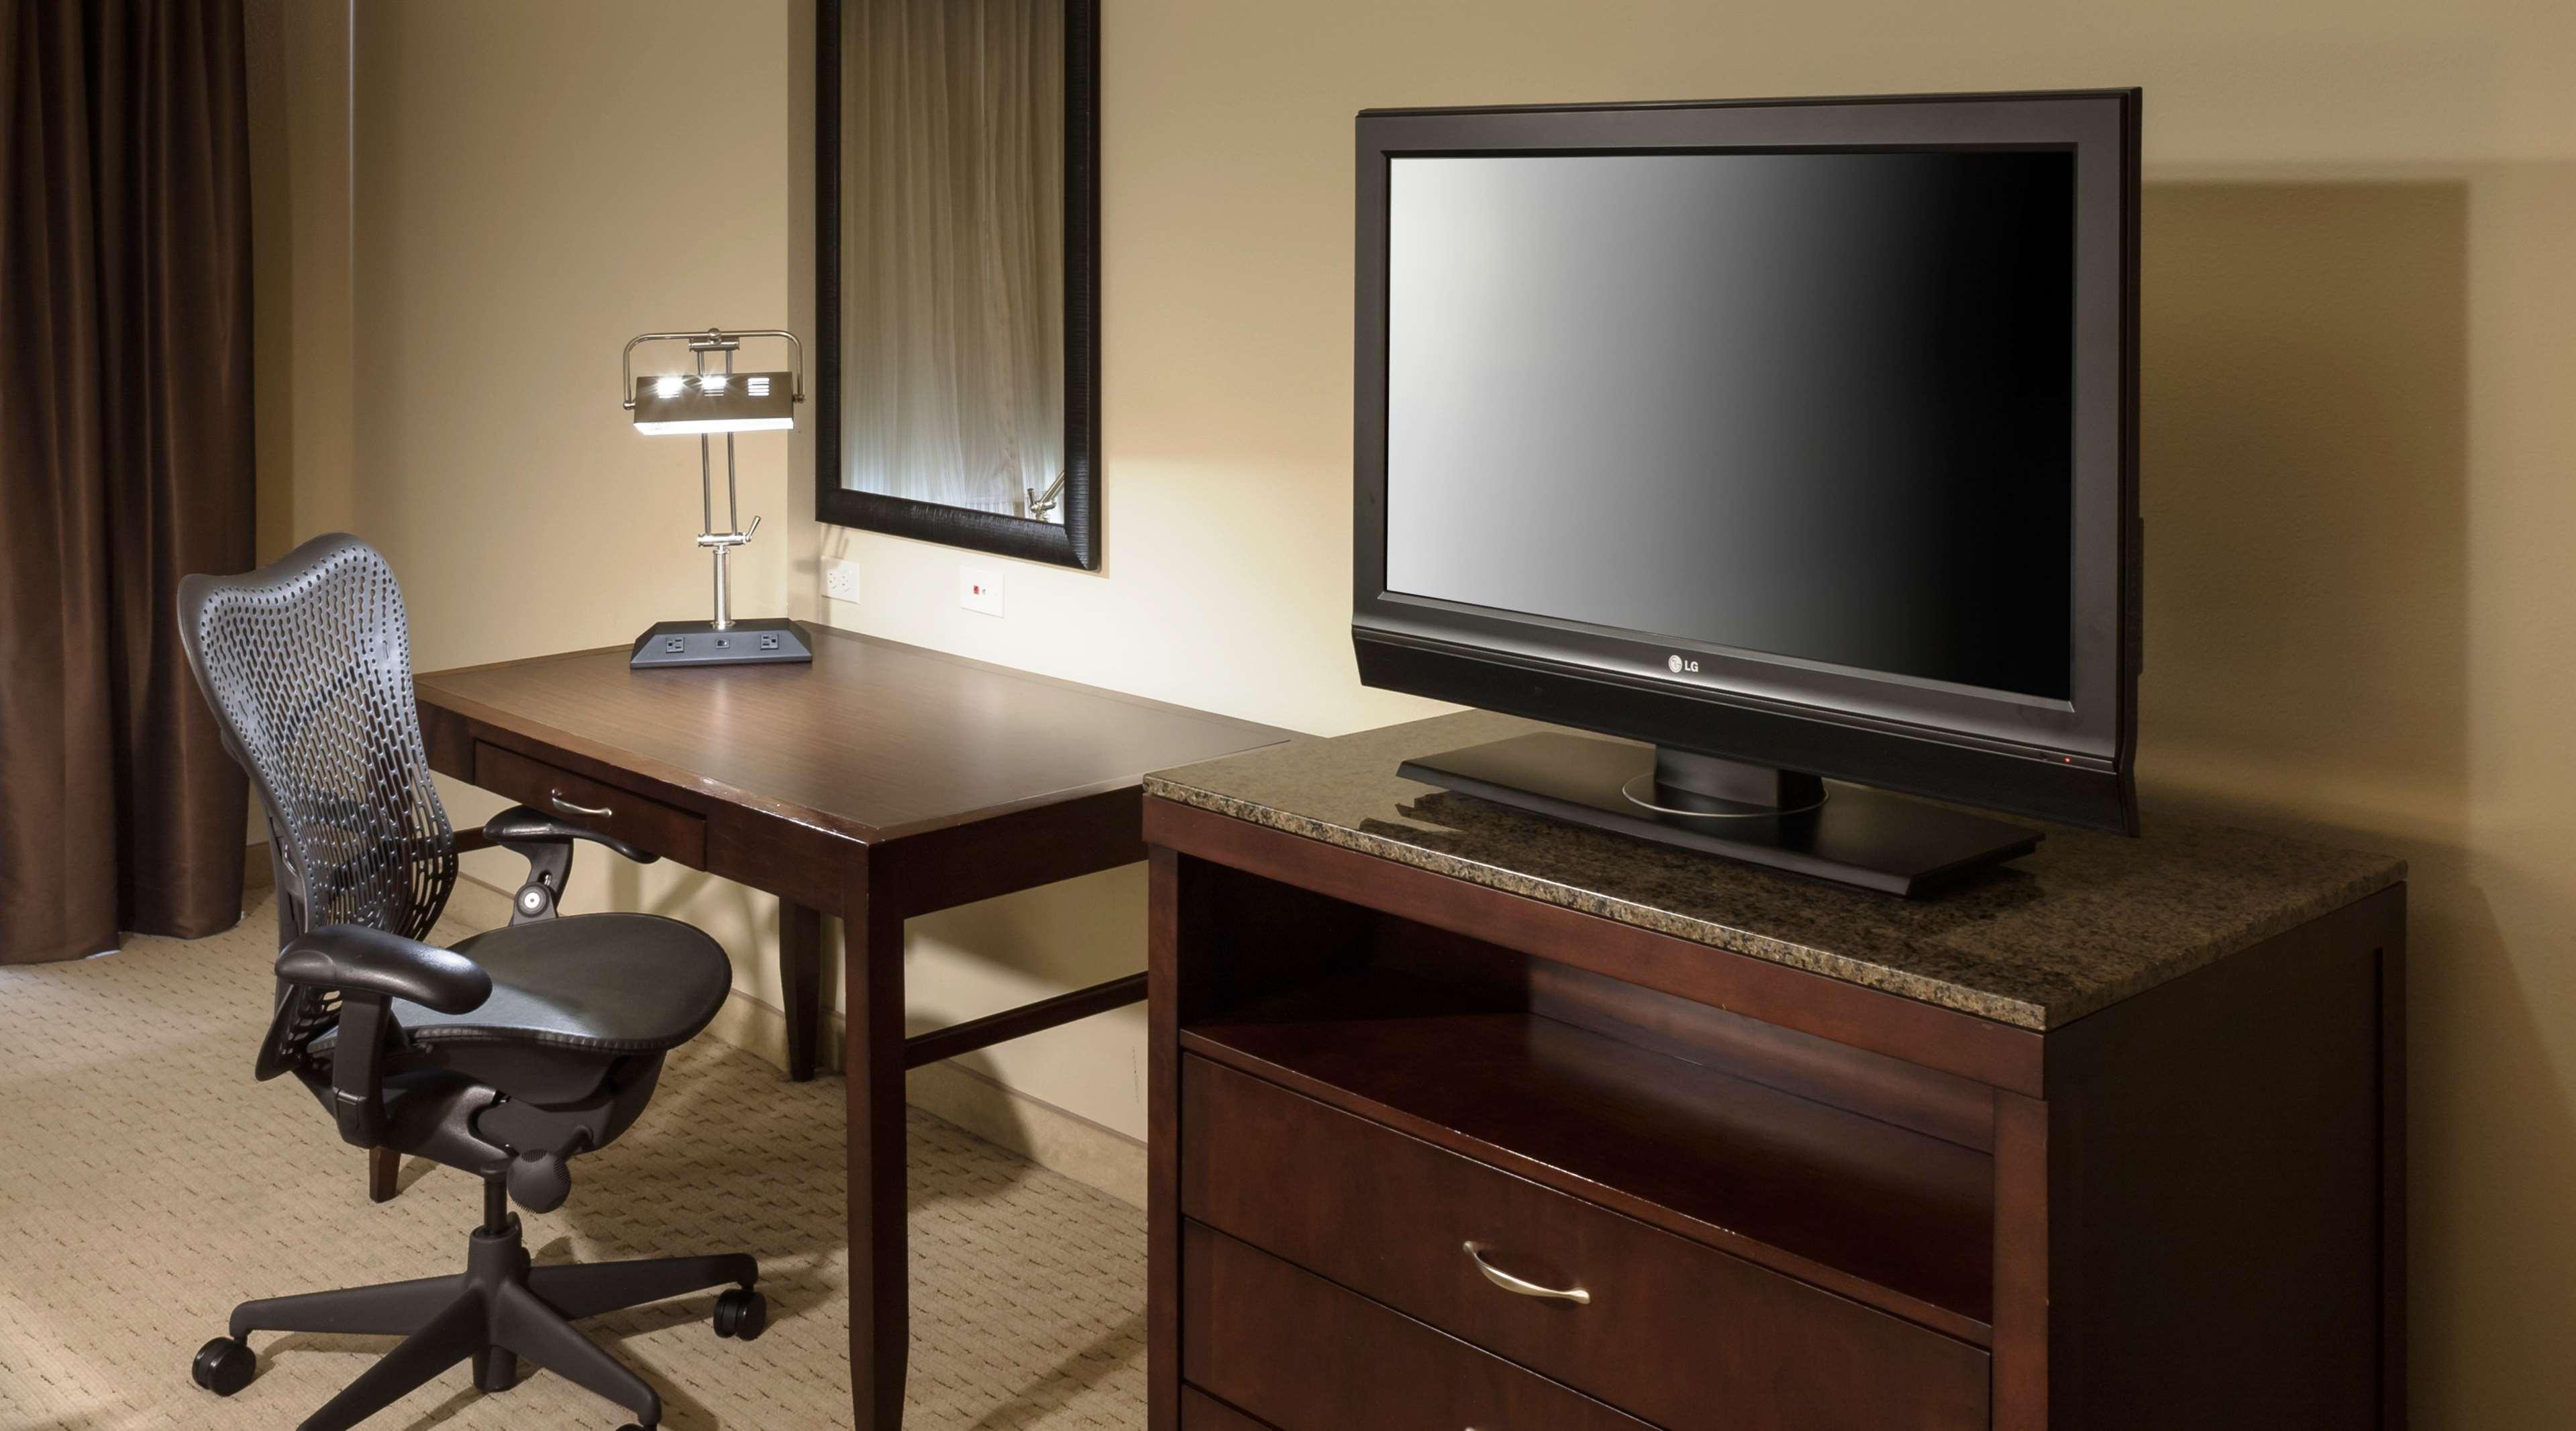 Hilton Garden Inn DFW North Grapevine image 31